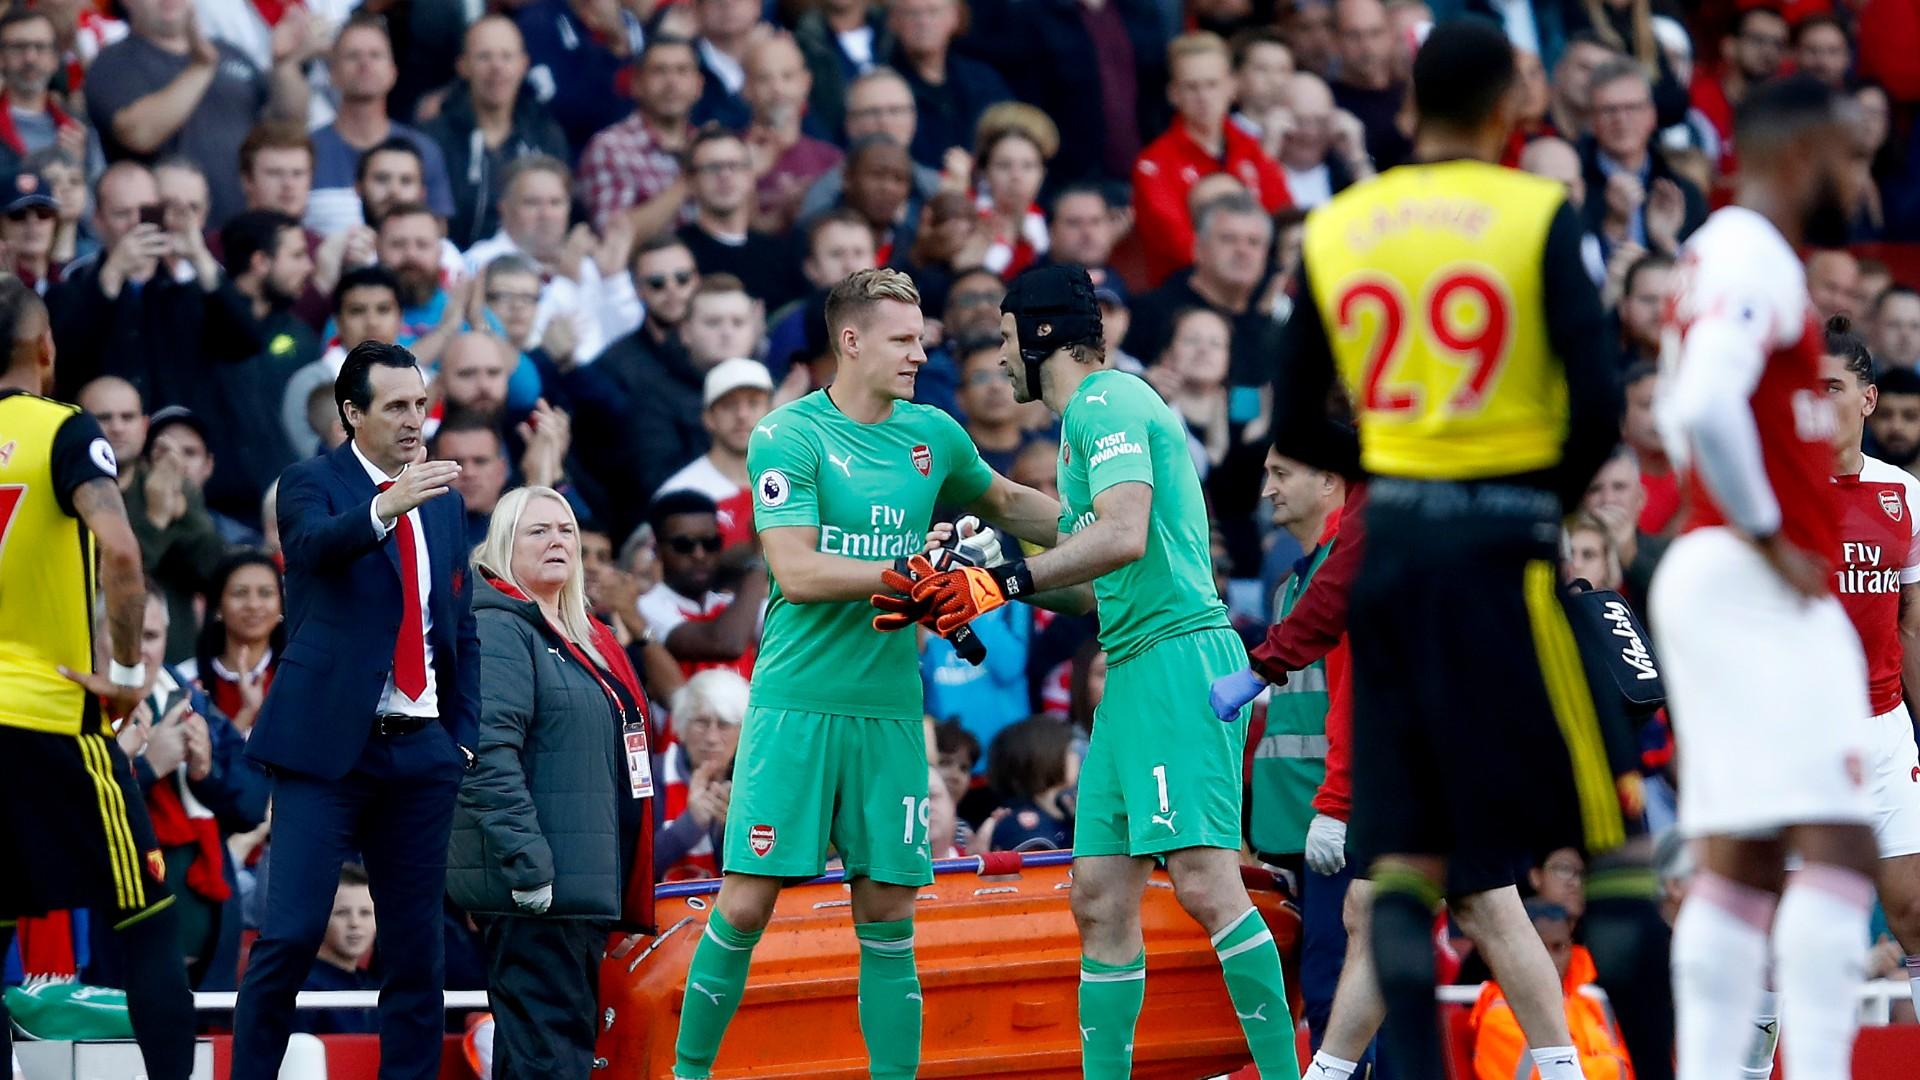 Bernd Leno Petr Cech Arsenal 2018/19